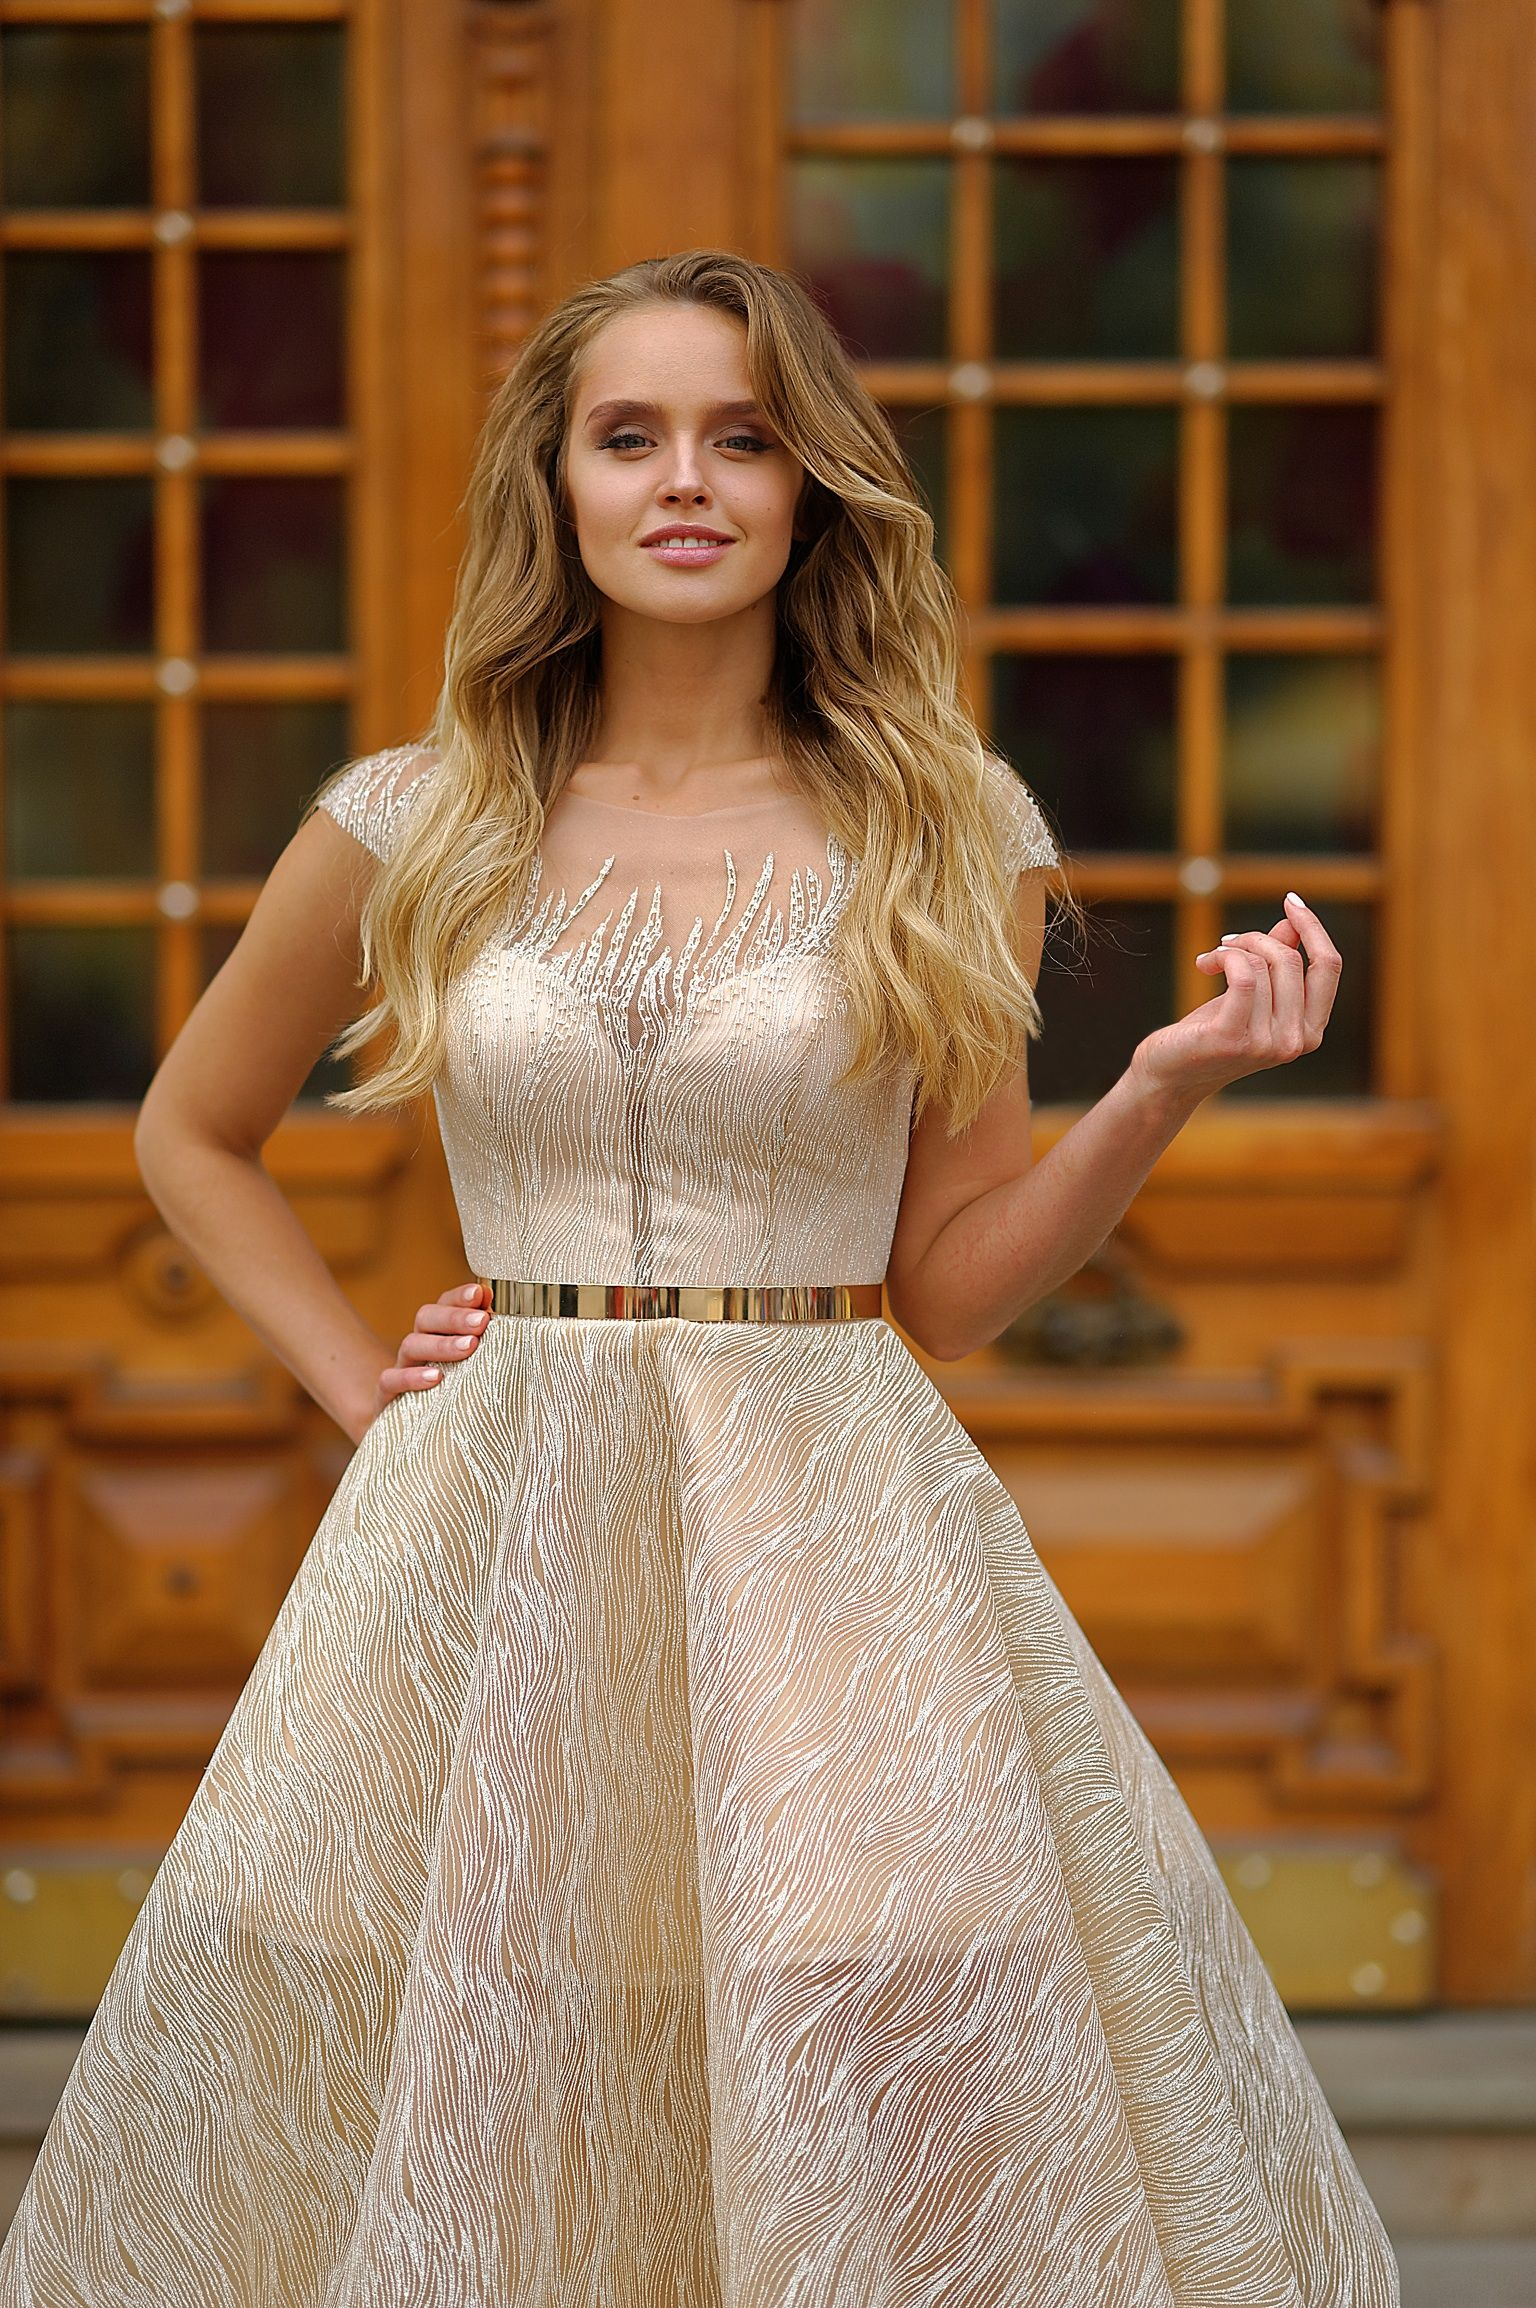 Lace dress vintage  Wedding dress silhouette Lace dress wedding dress vintage Ball